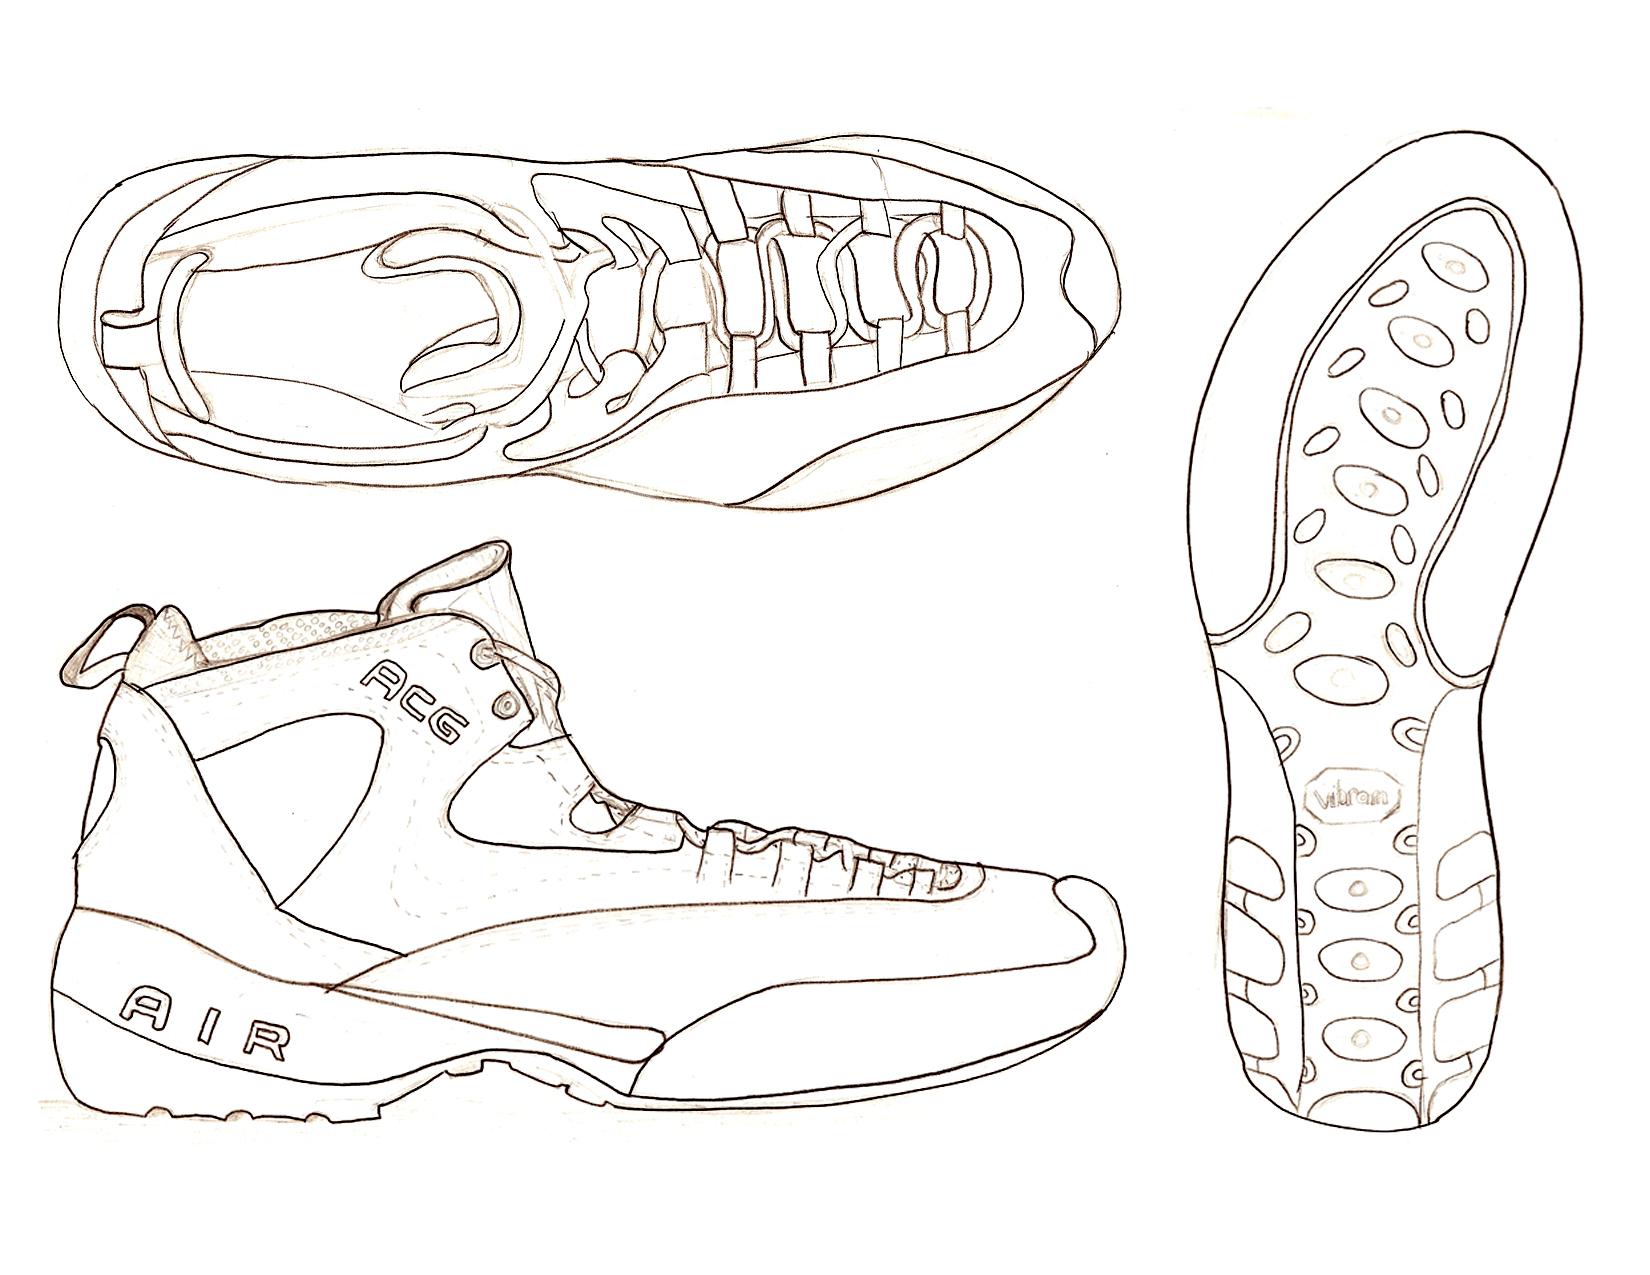 Footwear Doodle(1)